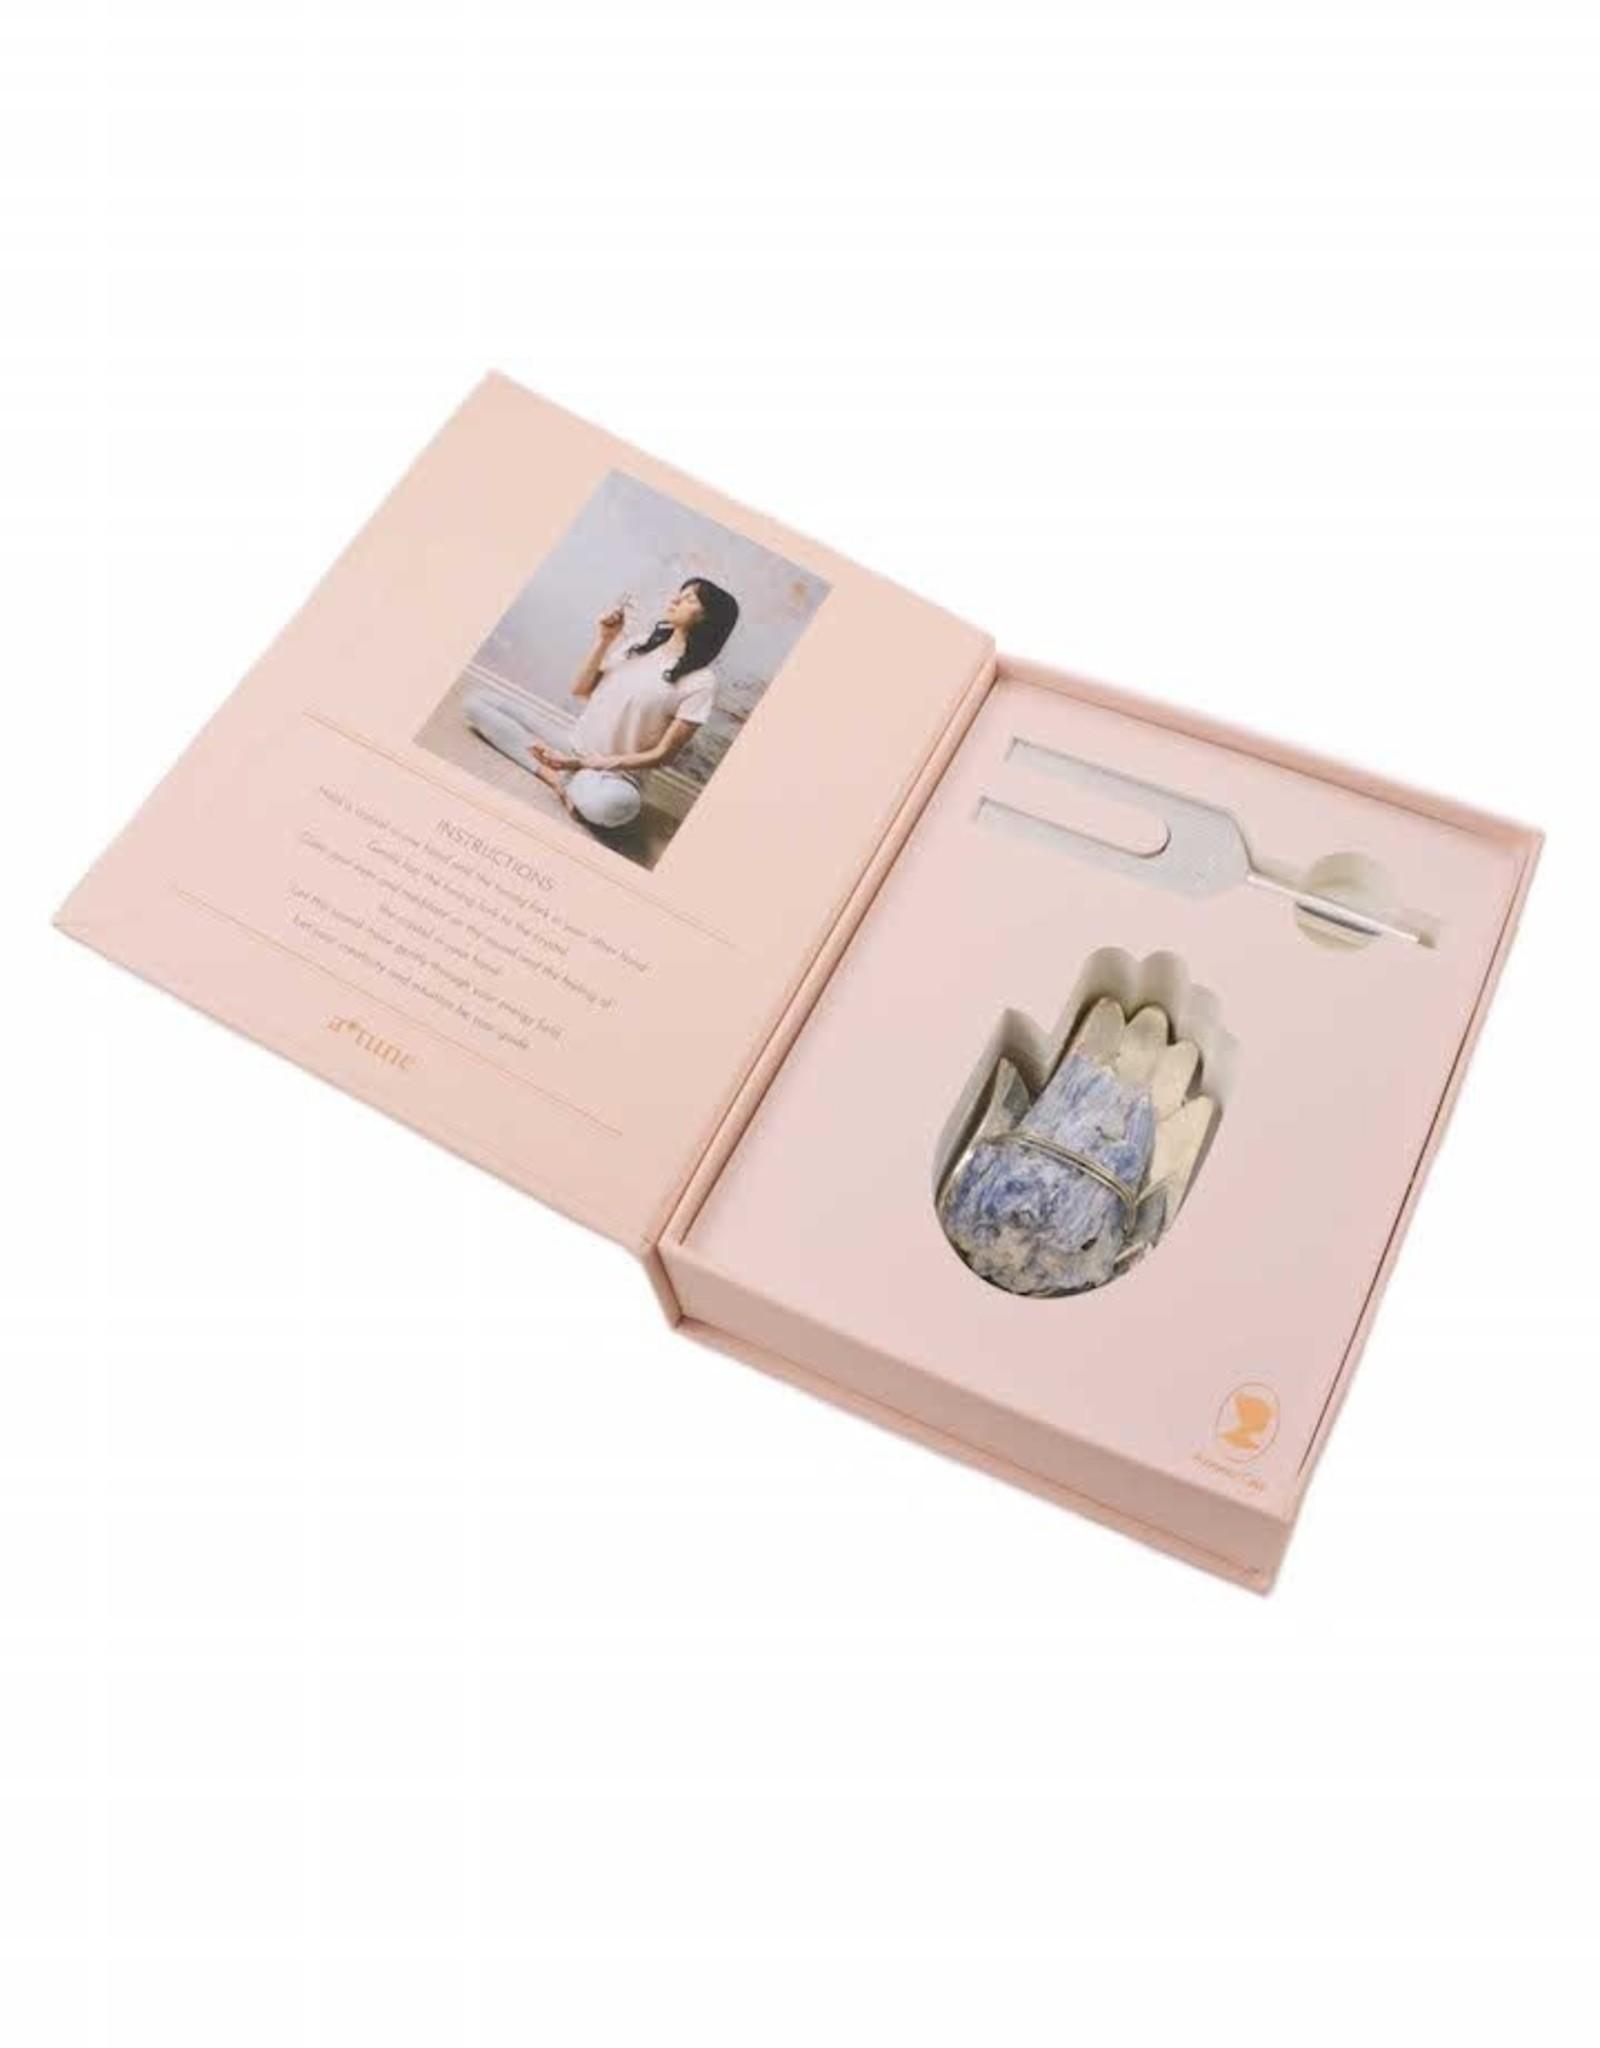 Ariana Ost Sound Healing Crystal Kit: Hand